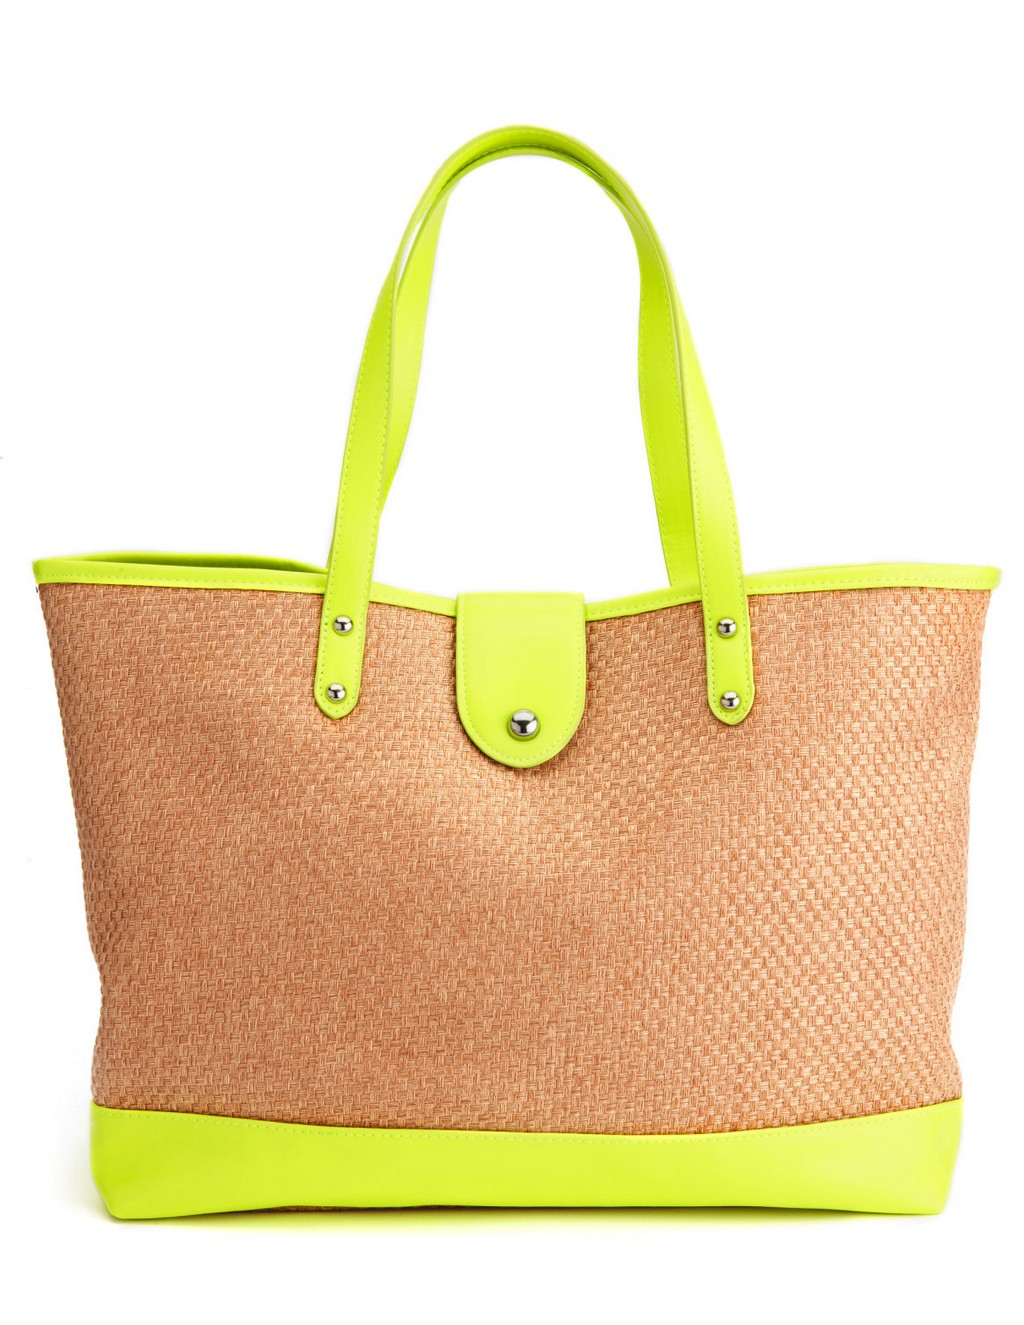 beach bags bueno handbags rachel zoe handbags miche handbags